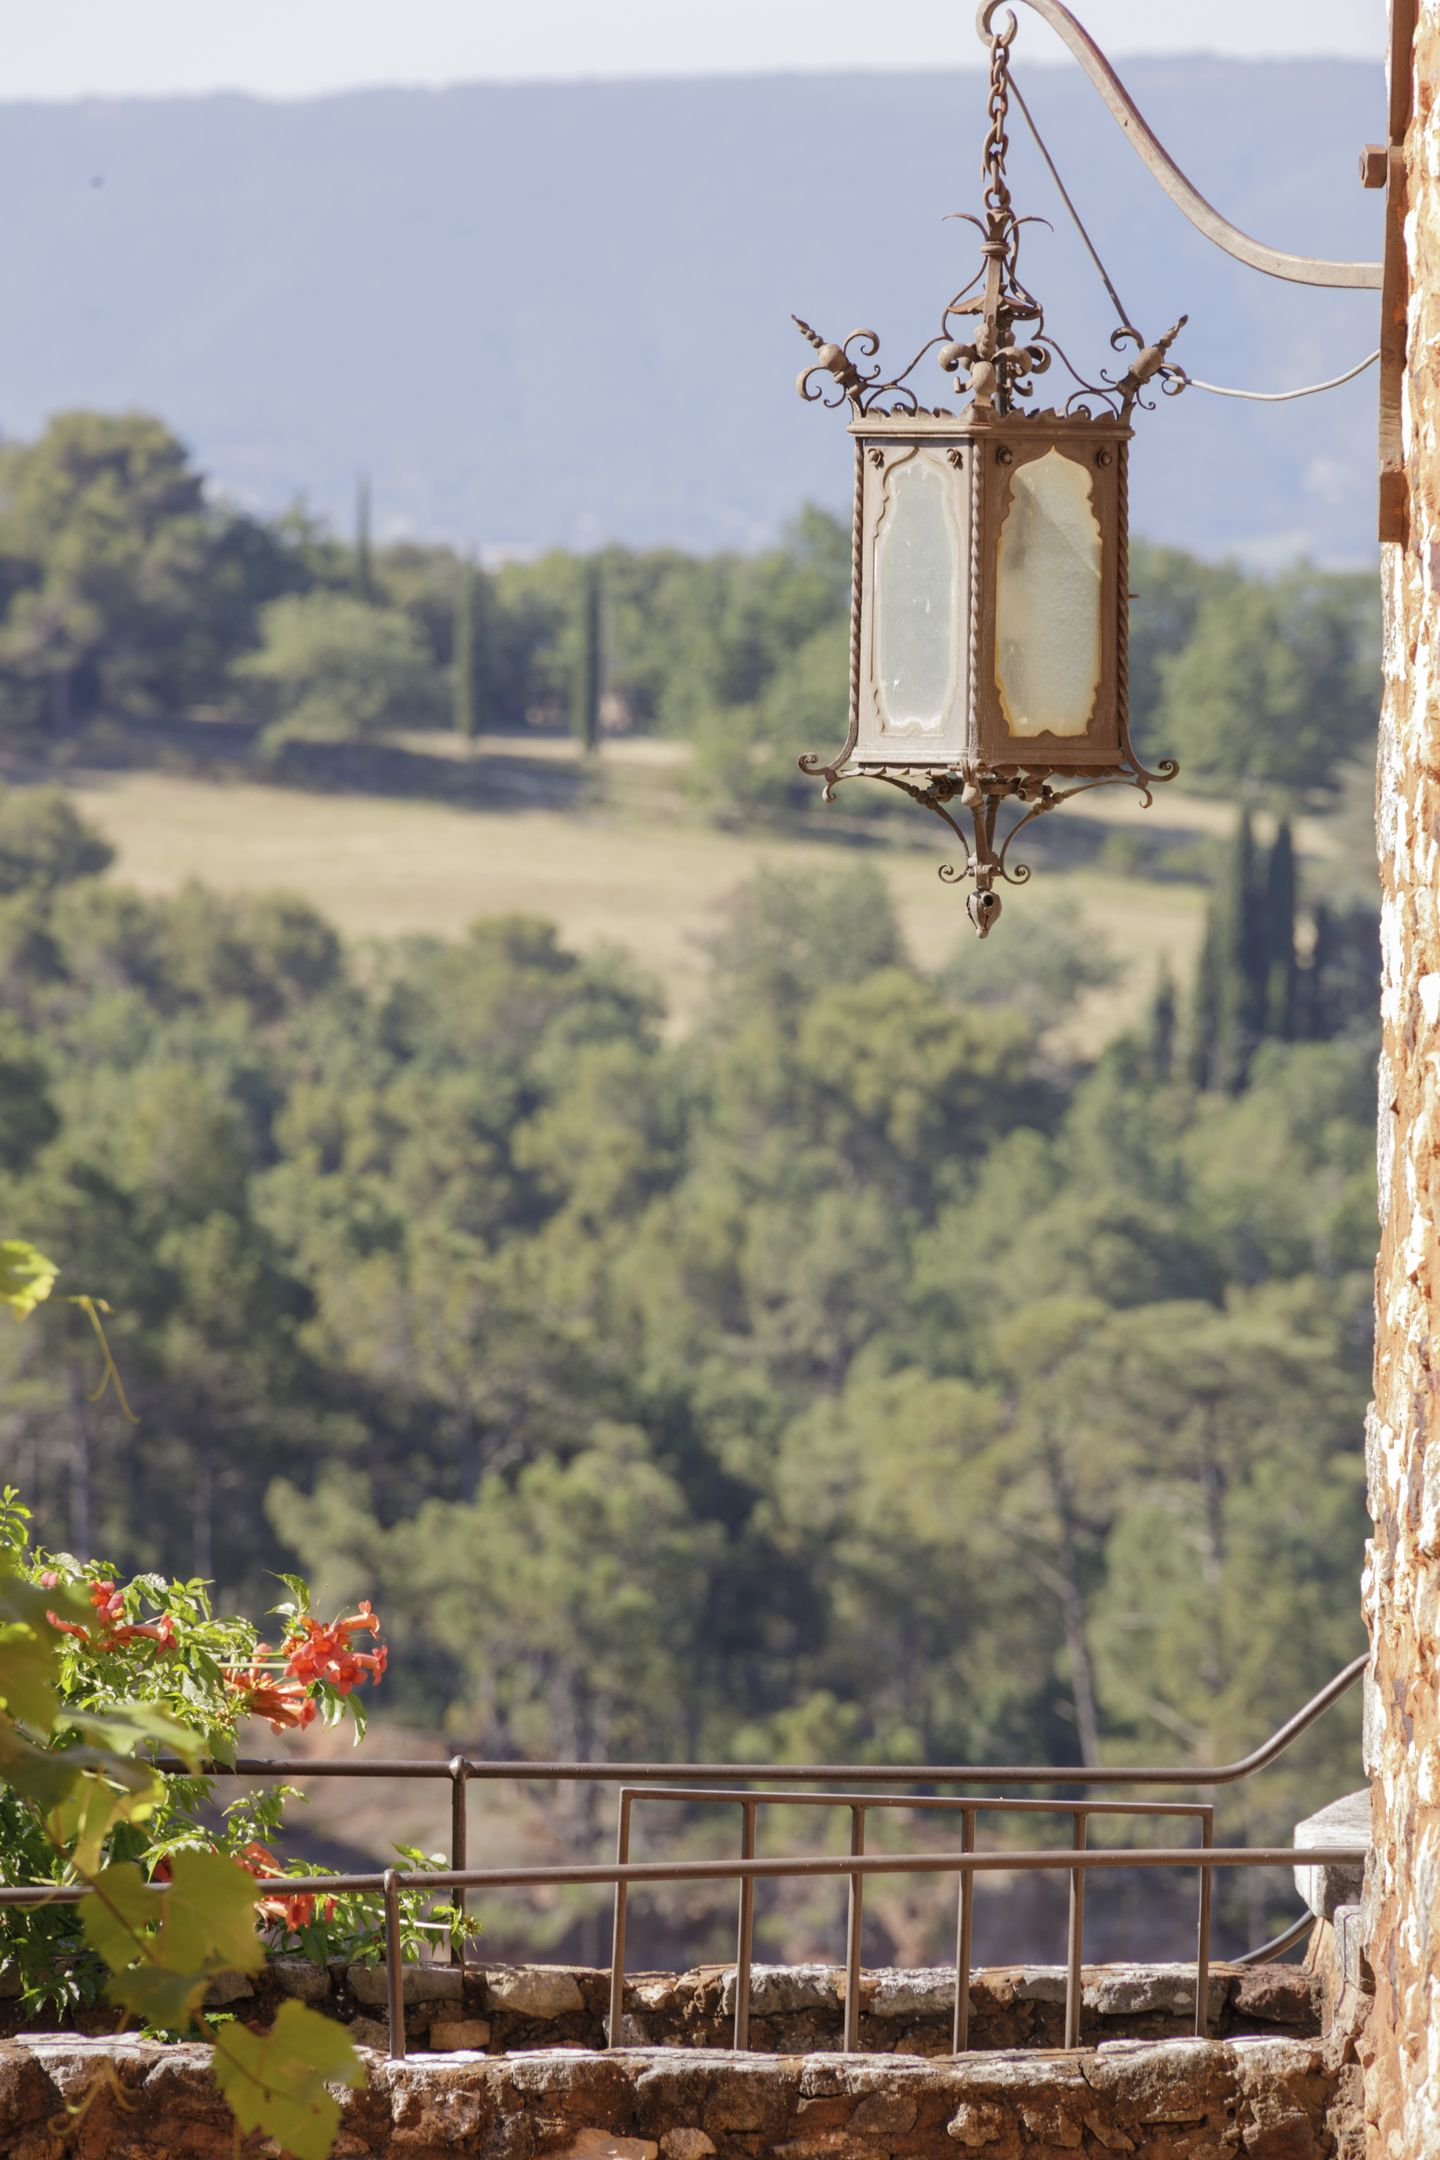 20210629-Provence-09-35-49-016